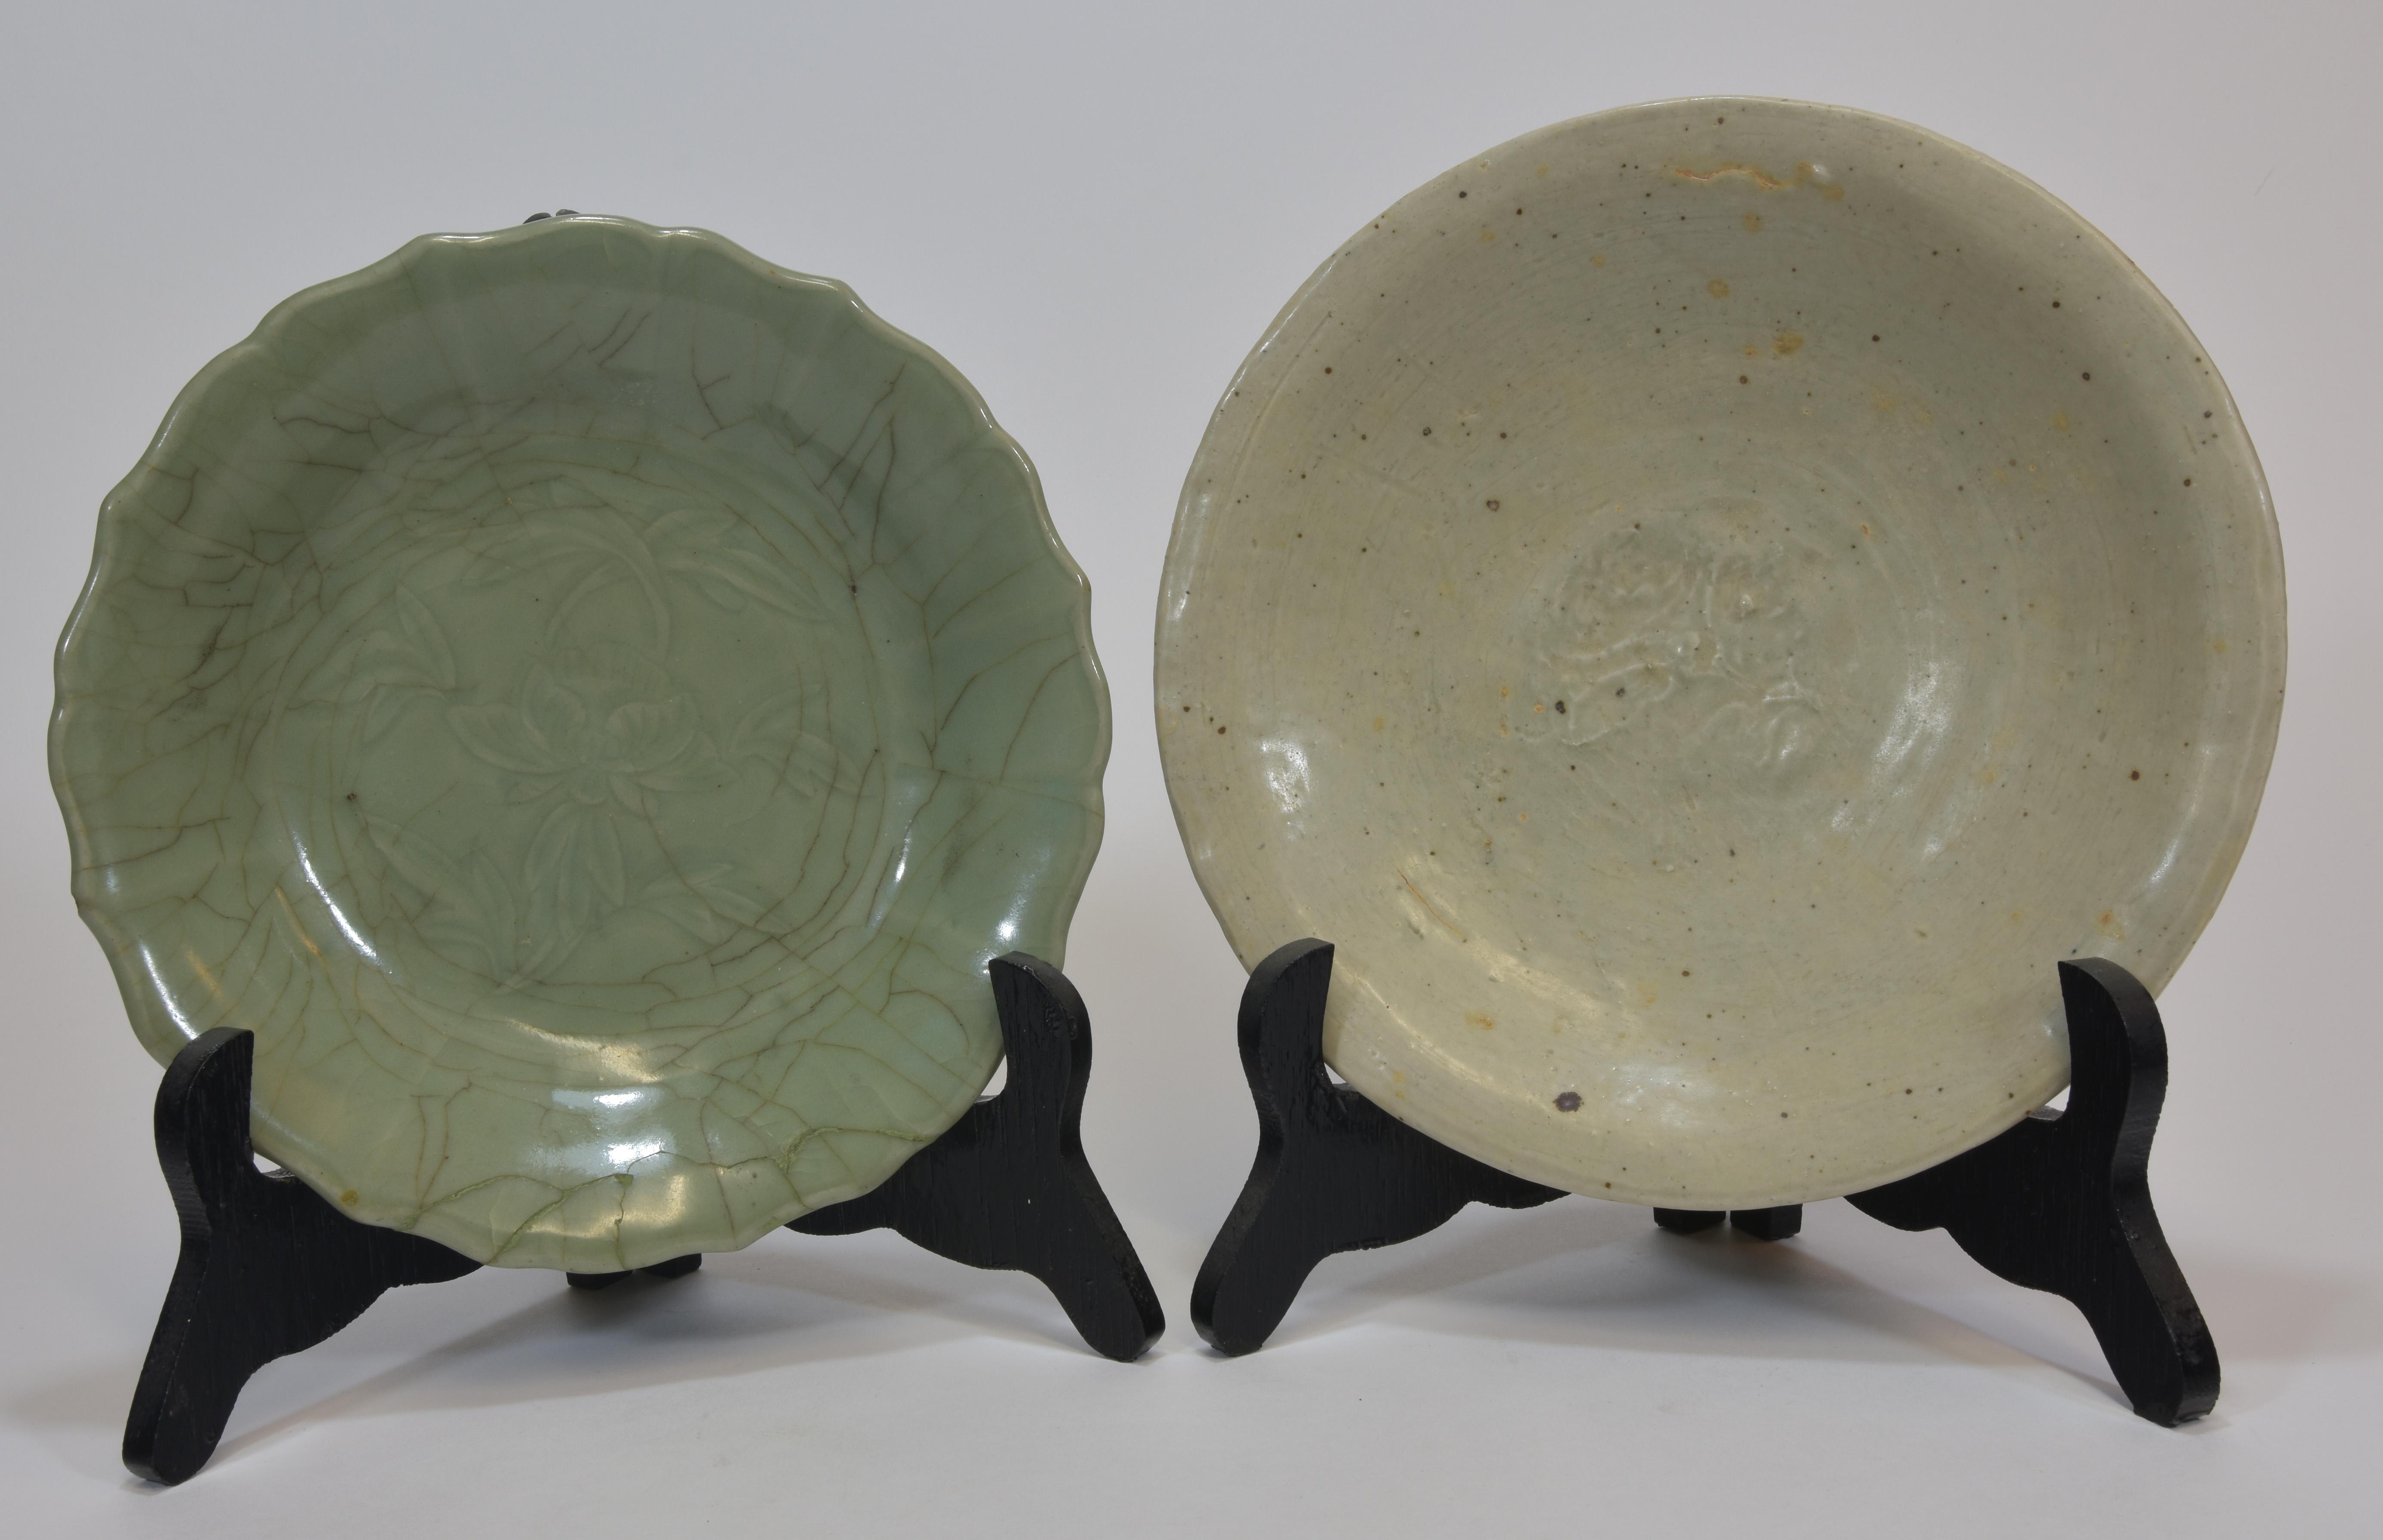 Lot 26 - Two Ming dynasty celadon dishes 20cm (2) 明朝時期 龍泉碟